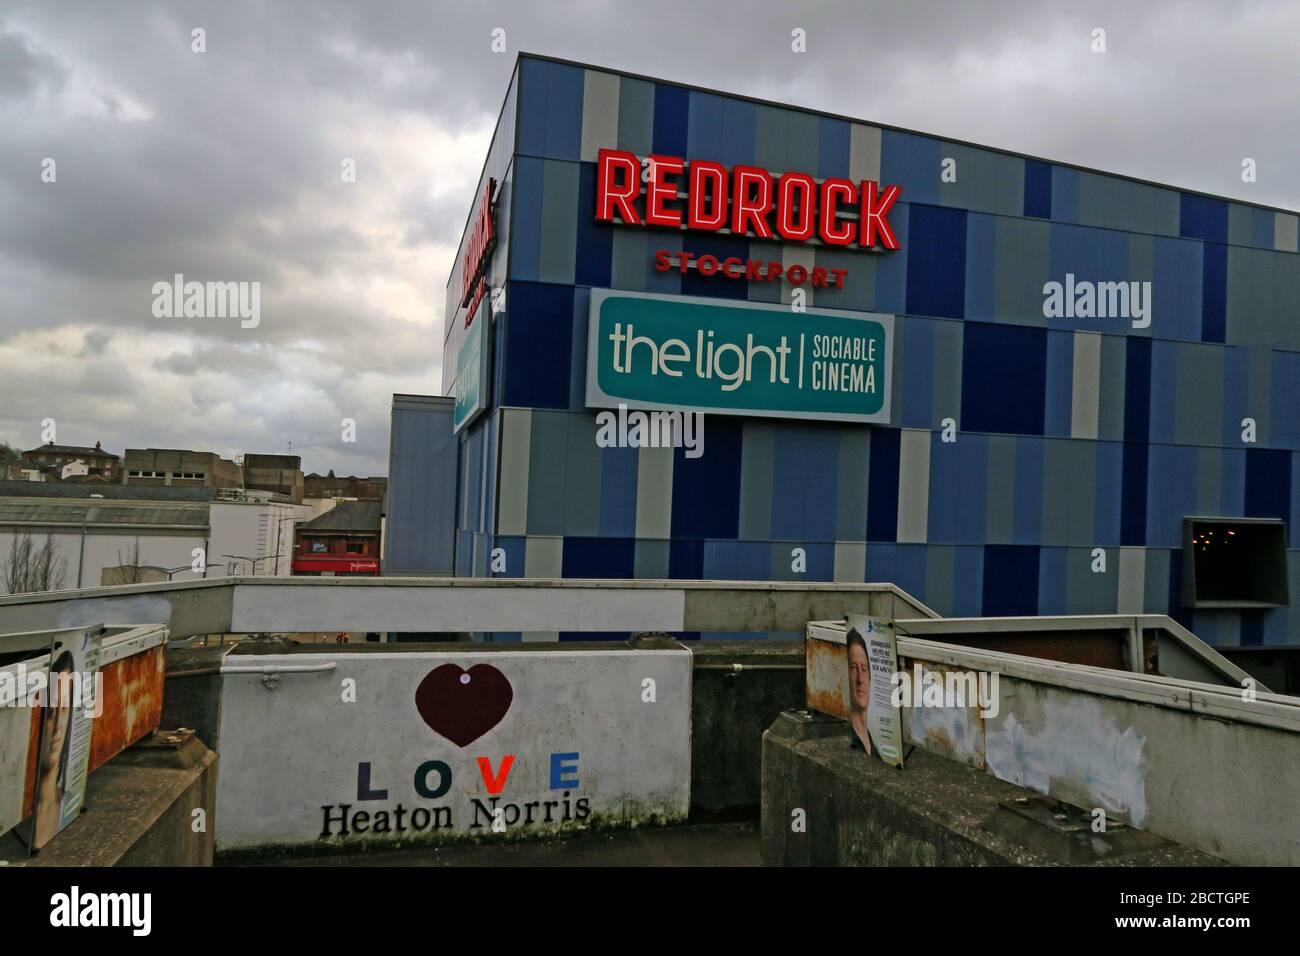 HotpixUK,@HotpixUk,GoTonySmith,Greater Manchester,Manchester,Cheshire,England,UK,town,ugly,SK1,Redrock,Unit 10,SK1 1SA,sign,leisure destination,leisure,destination,light cinema,blue,building,architecture,Redrock development,M60,entertainment complex,The Light Cinema,Britains ugliest building,Carbuncle Cup 2018,Carbuncle Cup,2018,bad architecture,BD,Building Design,ten-screen,complex,structure,shed,Thomas Lane